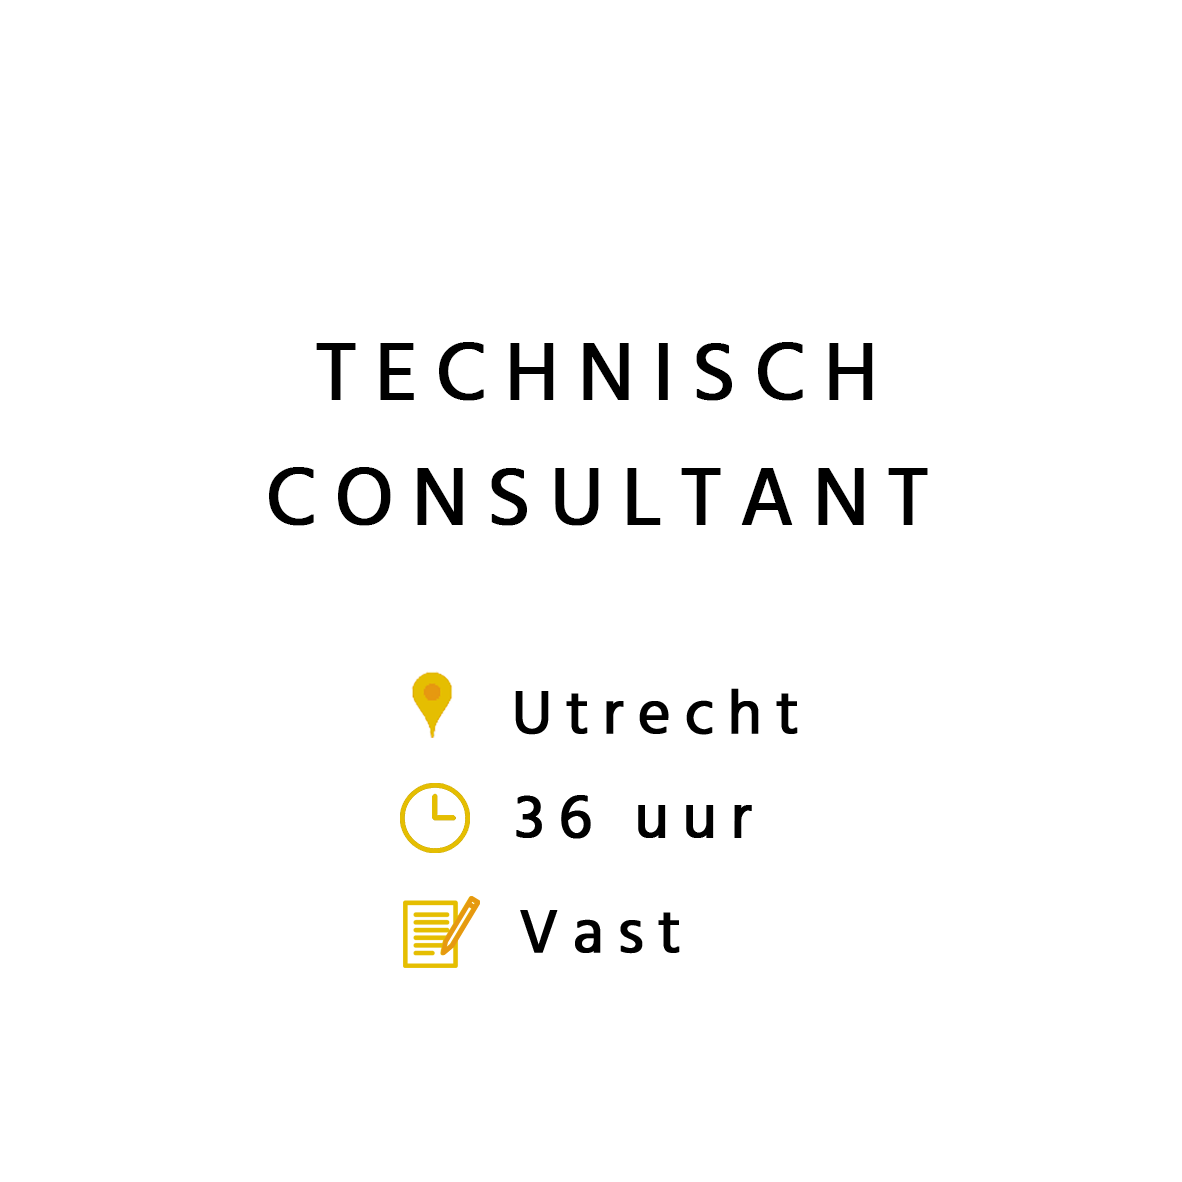 Technisch Consultant